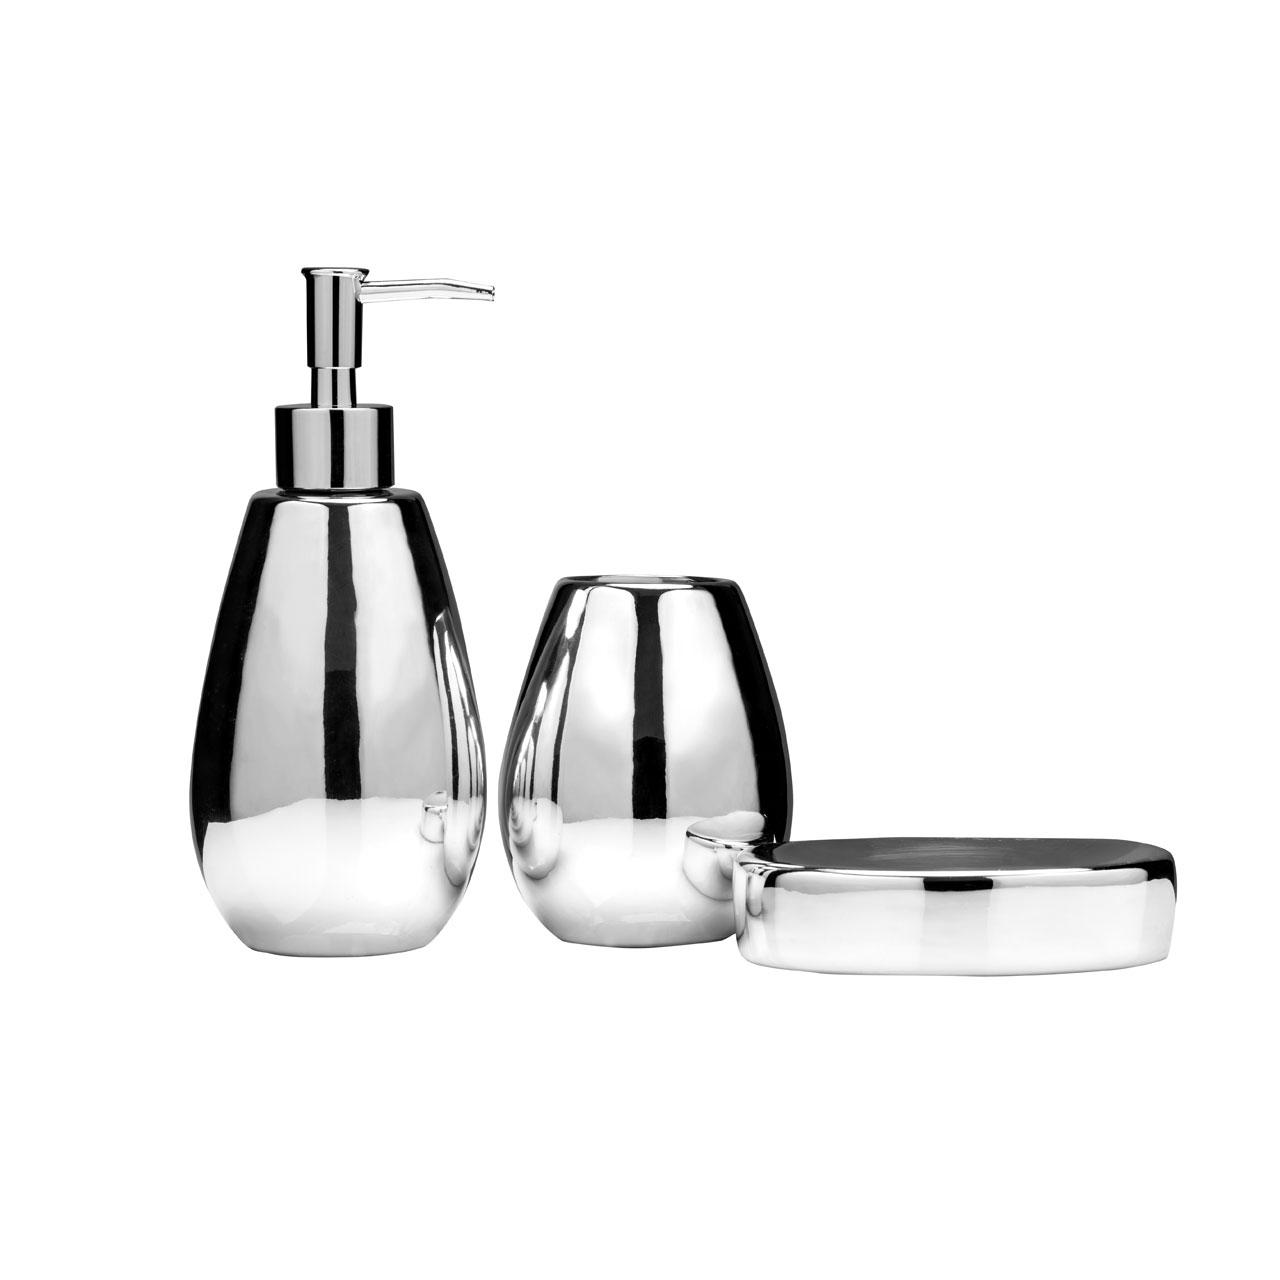 Premier housewares magpie silver bathroom accessory set for Silver bathroom accessories set